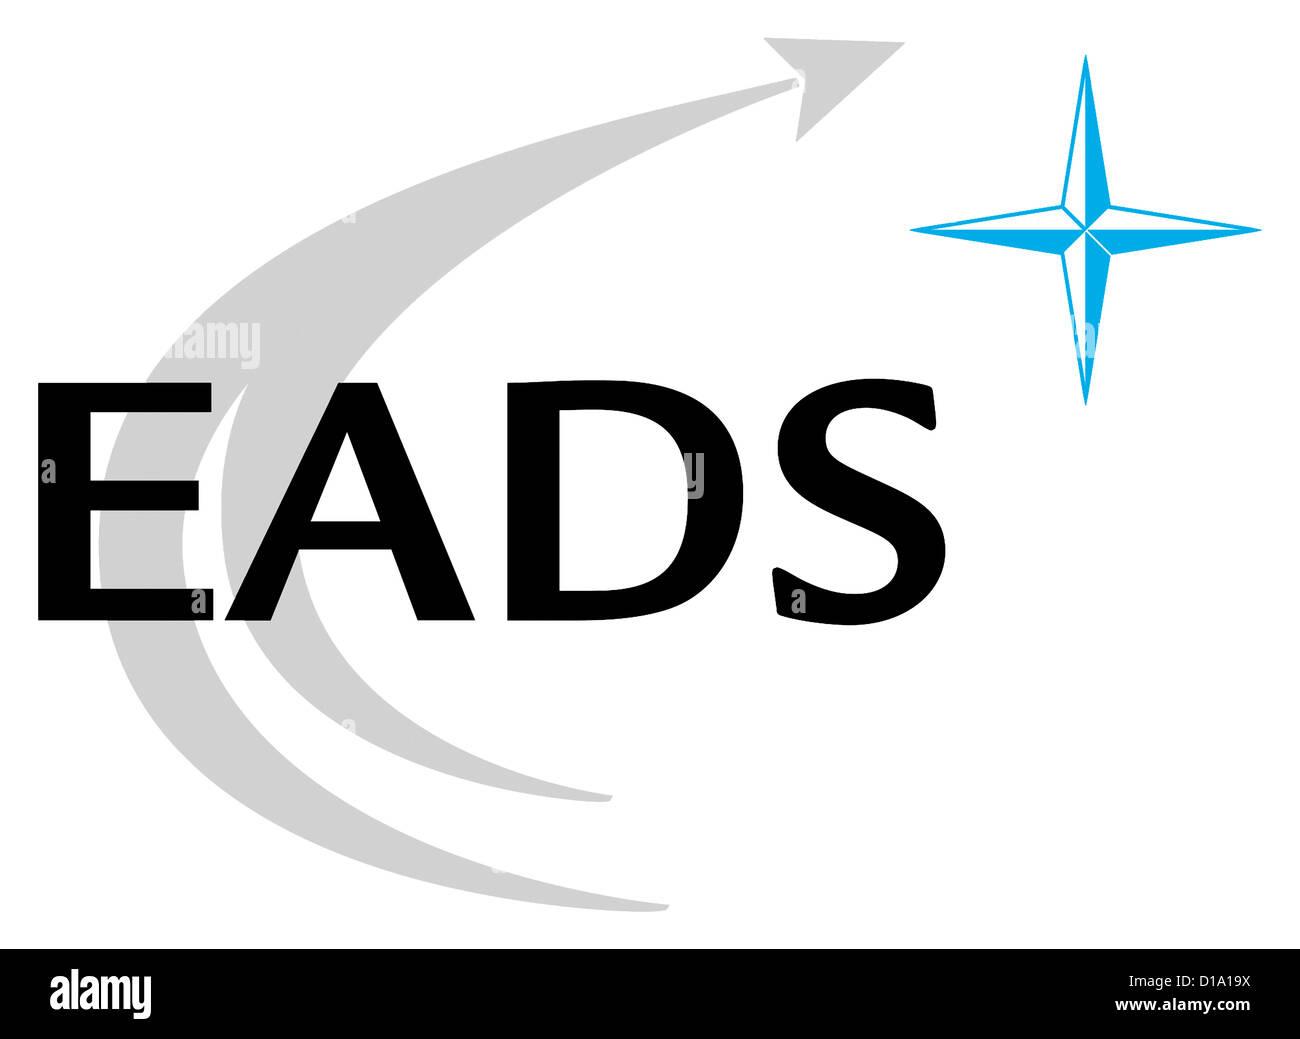 Logo of the European Aeronautic Defence and Space Company EADS. - Stock Image